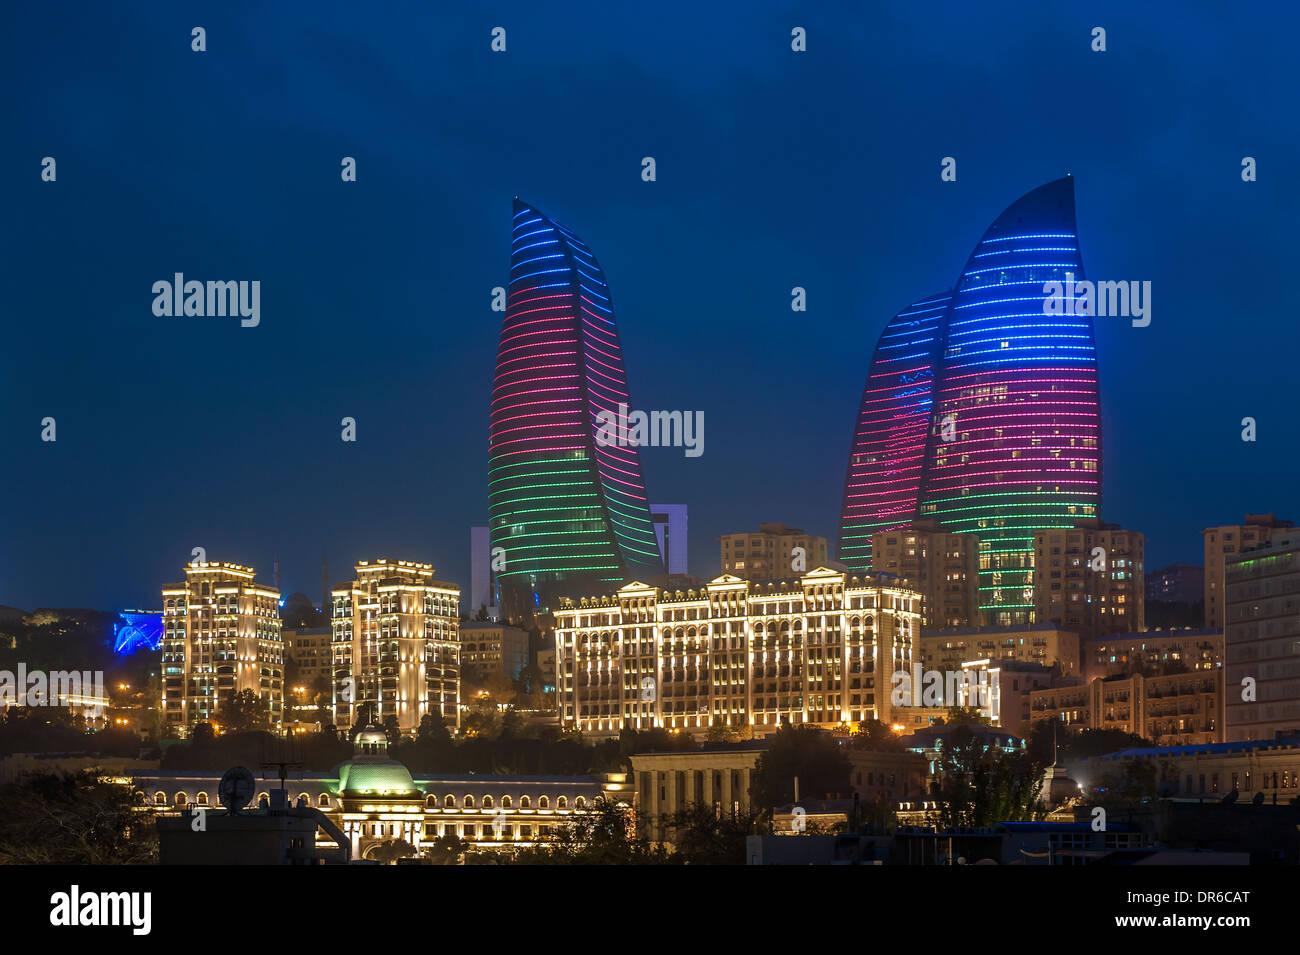 Flame Towers Baku Azerbaijan - Stock Image